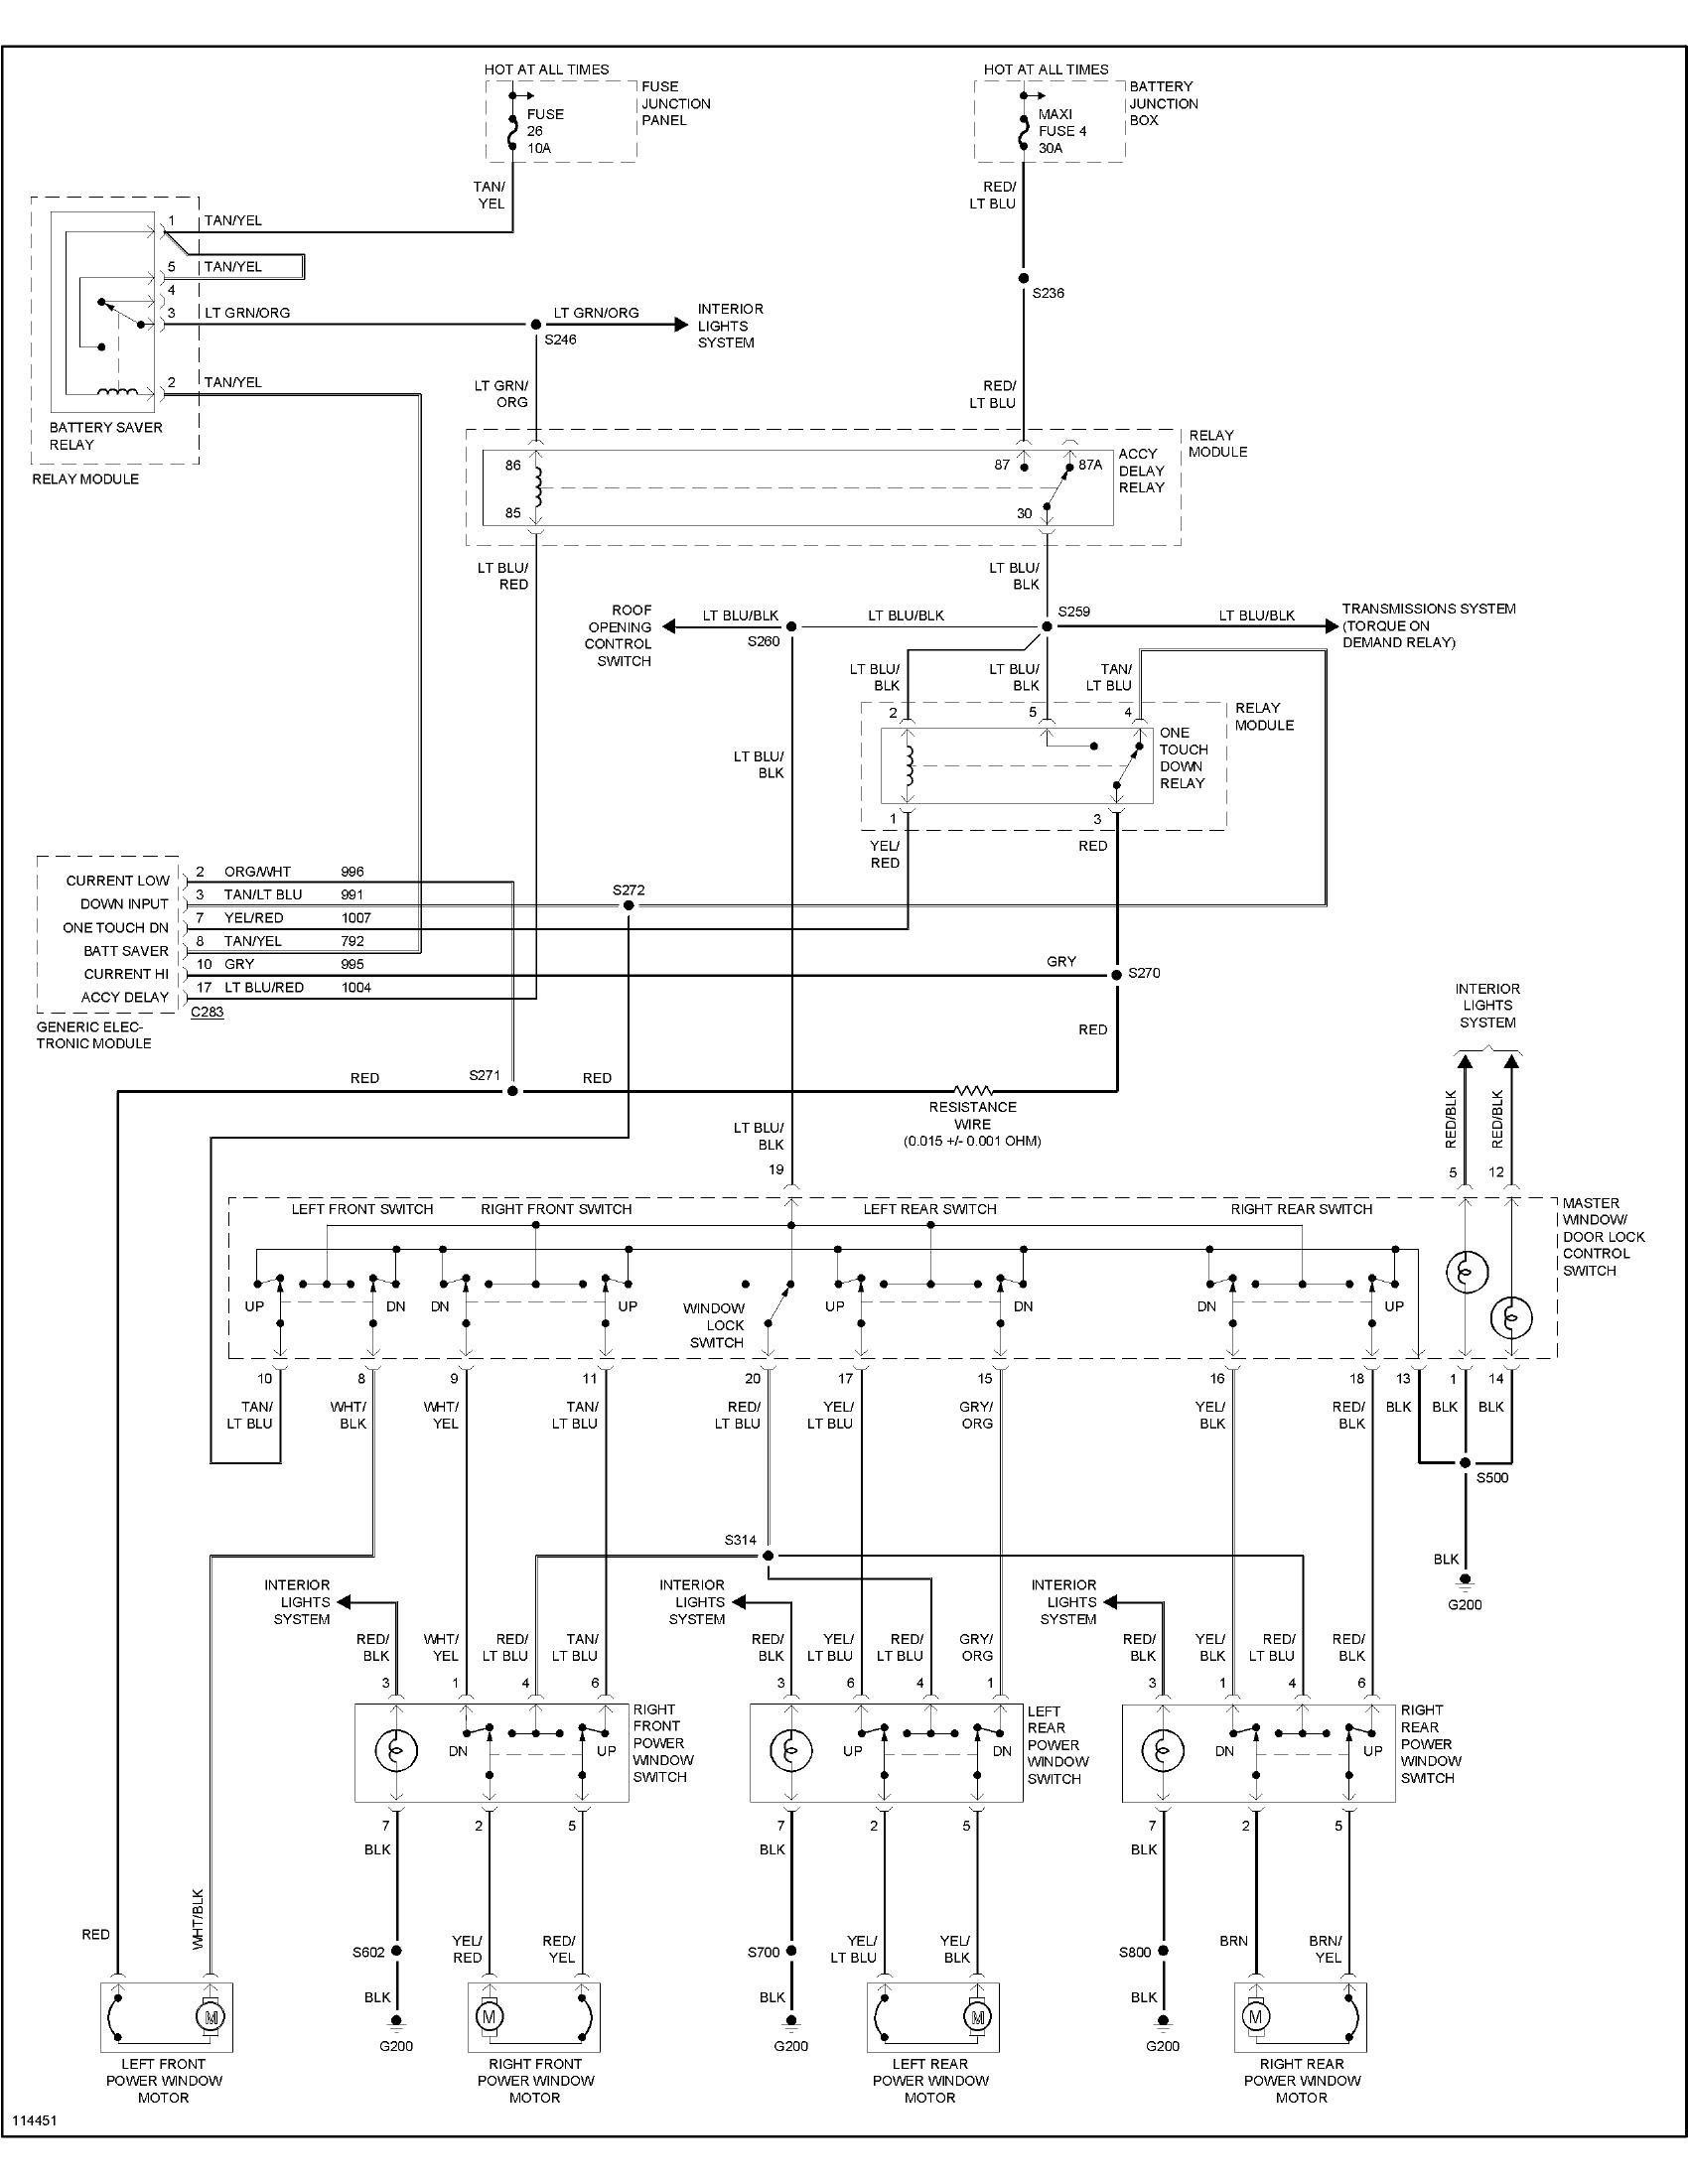 Wiring Diagram For 1999 Ford Explorer Saturn Sky Radio Wire Diagram Bege Wiring Diagram